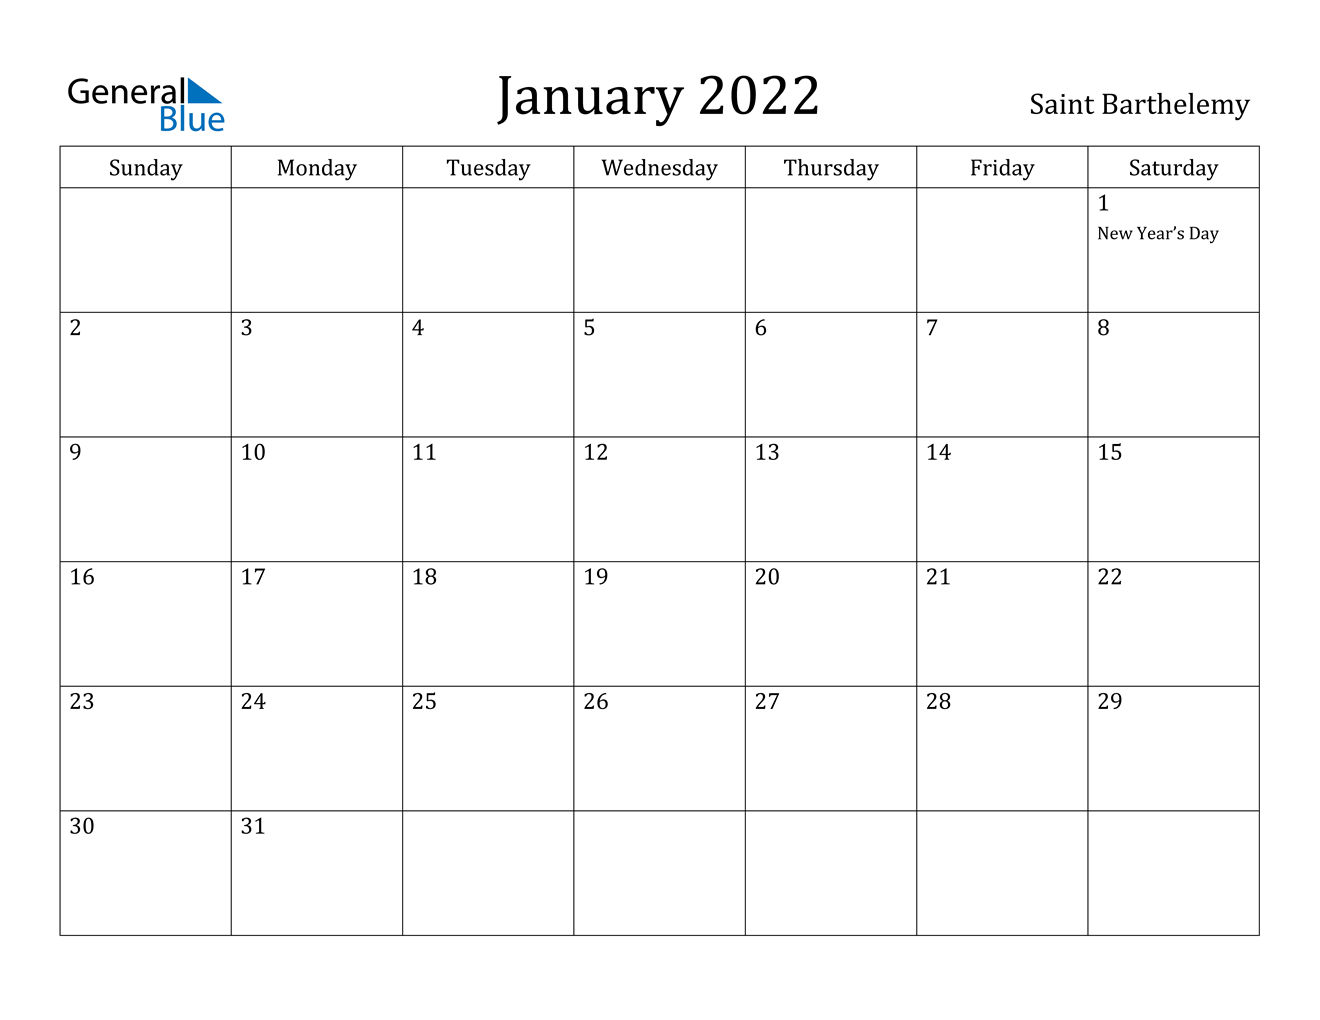 January 2022 Calendar - Saint Barthelemy